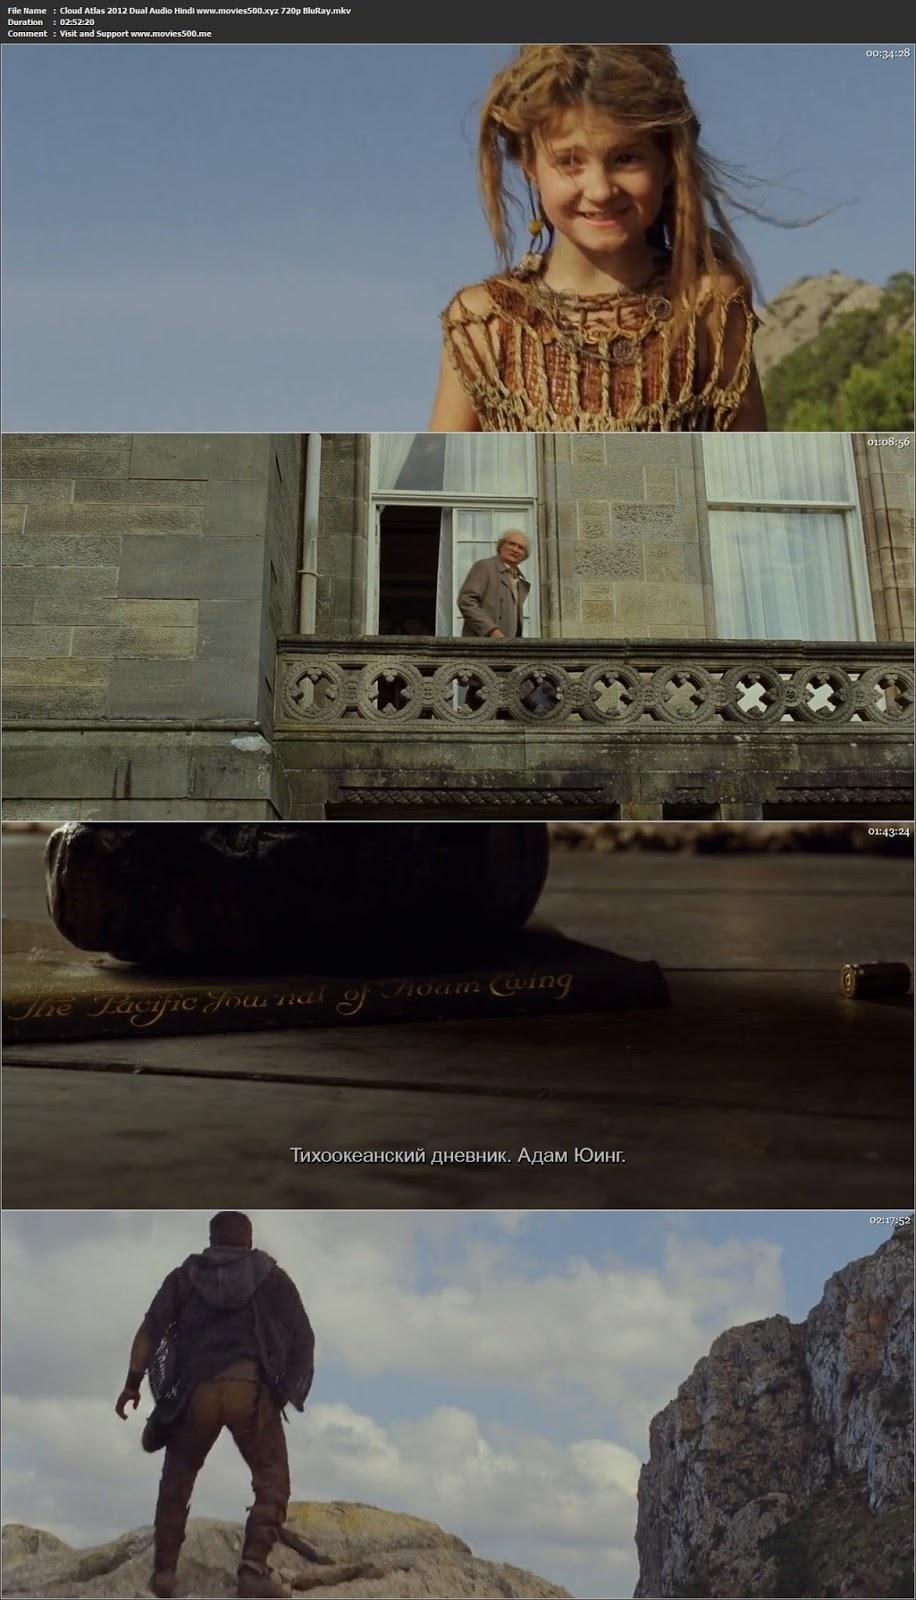 Cloud Atlas 2012 Dual Audio Hindi Full Movie BluRay 720p at movies500.bid